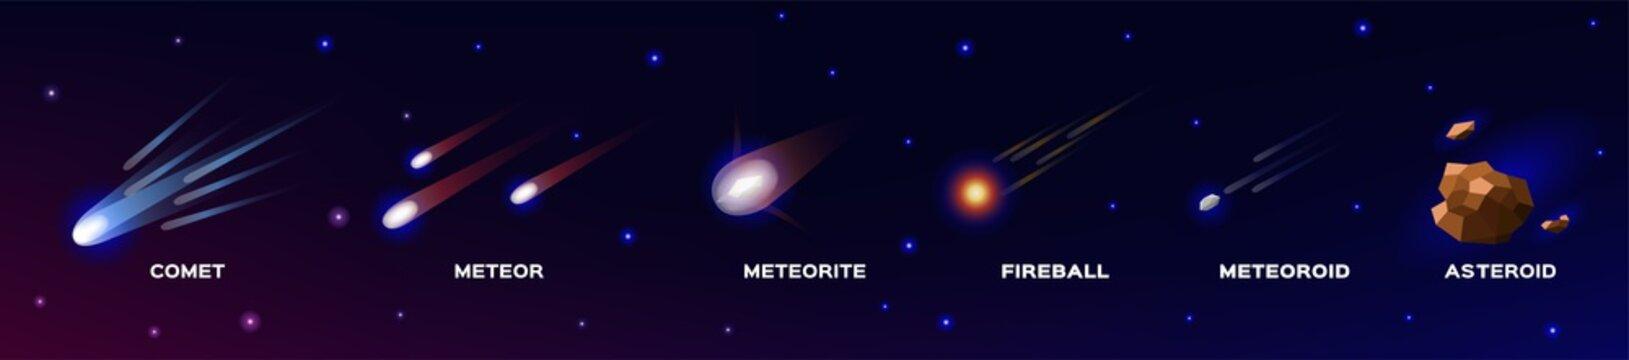 comet meteorite meteor fireball meteoroid and asteroid vector